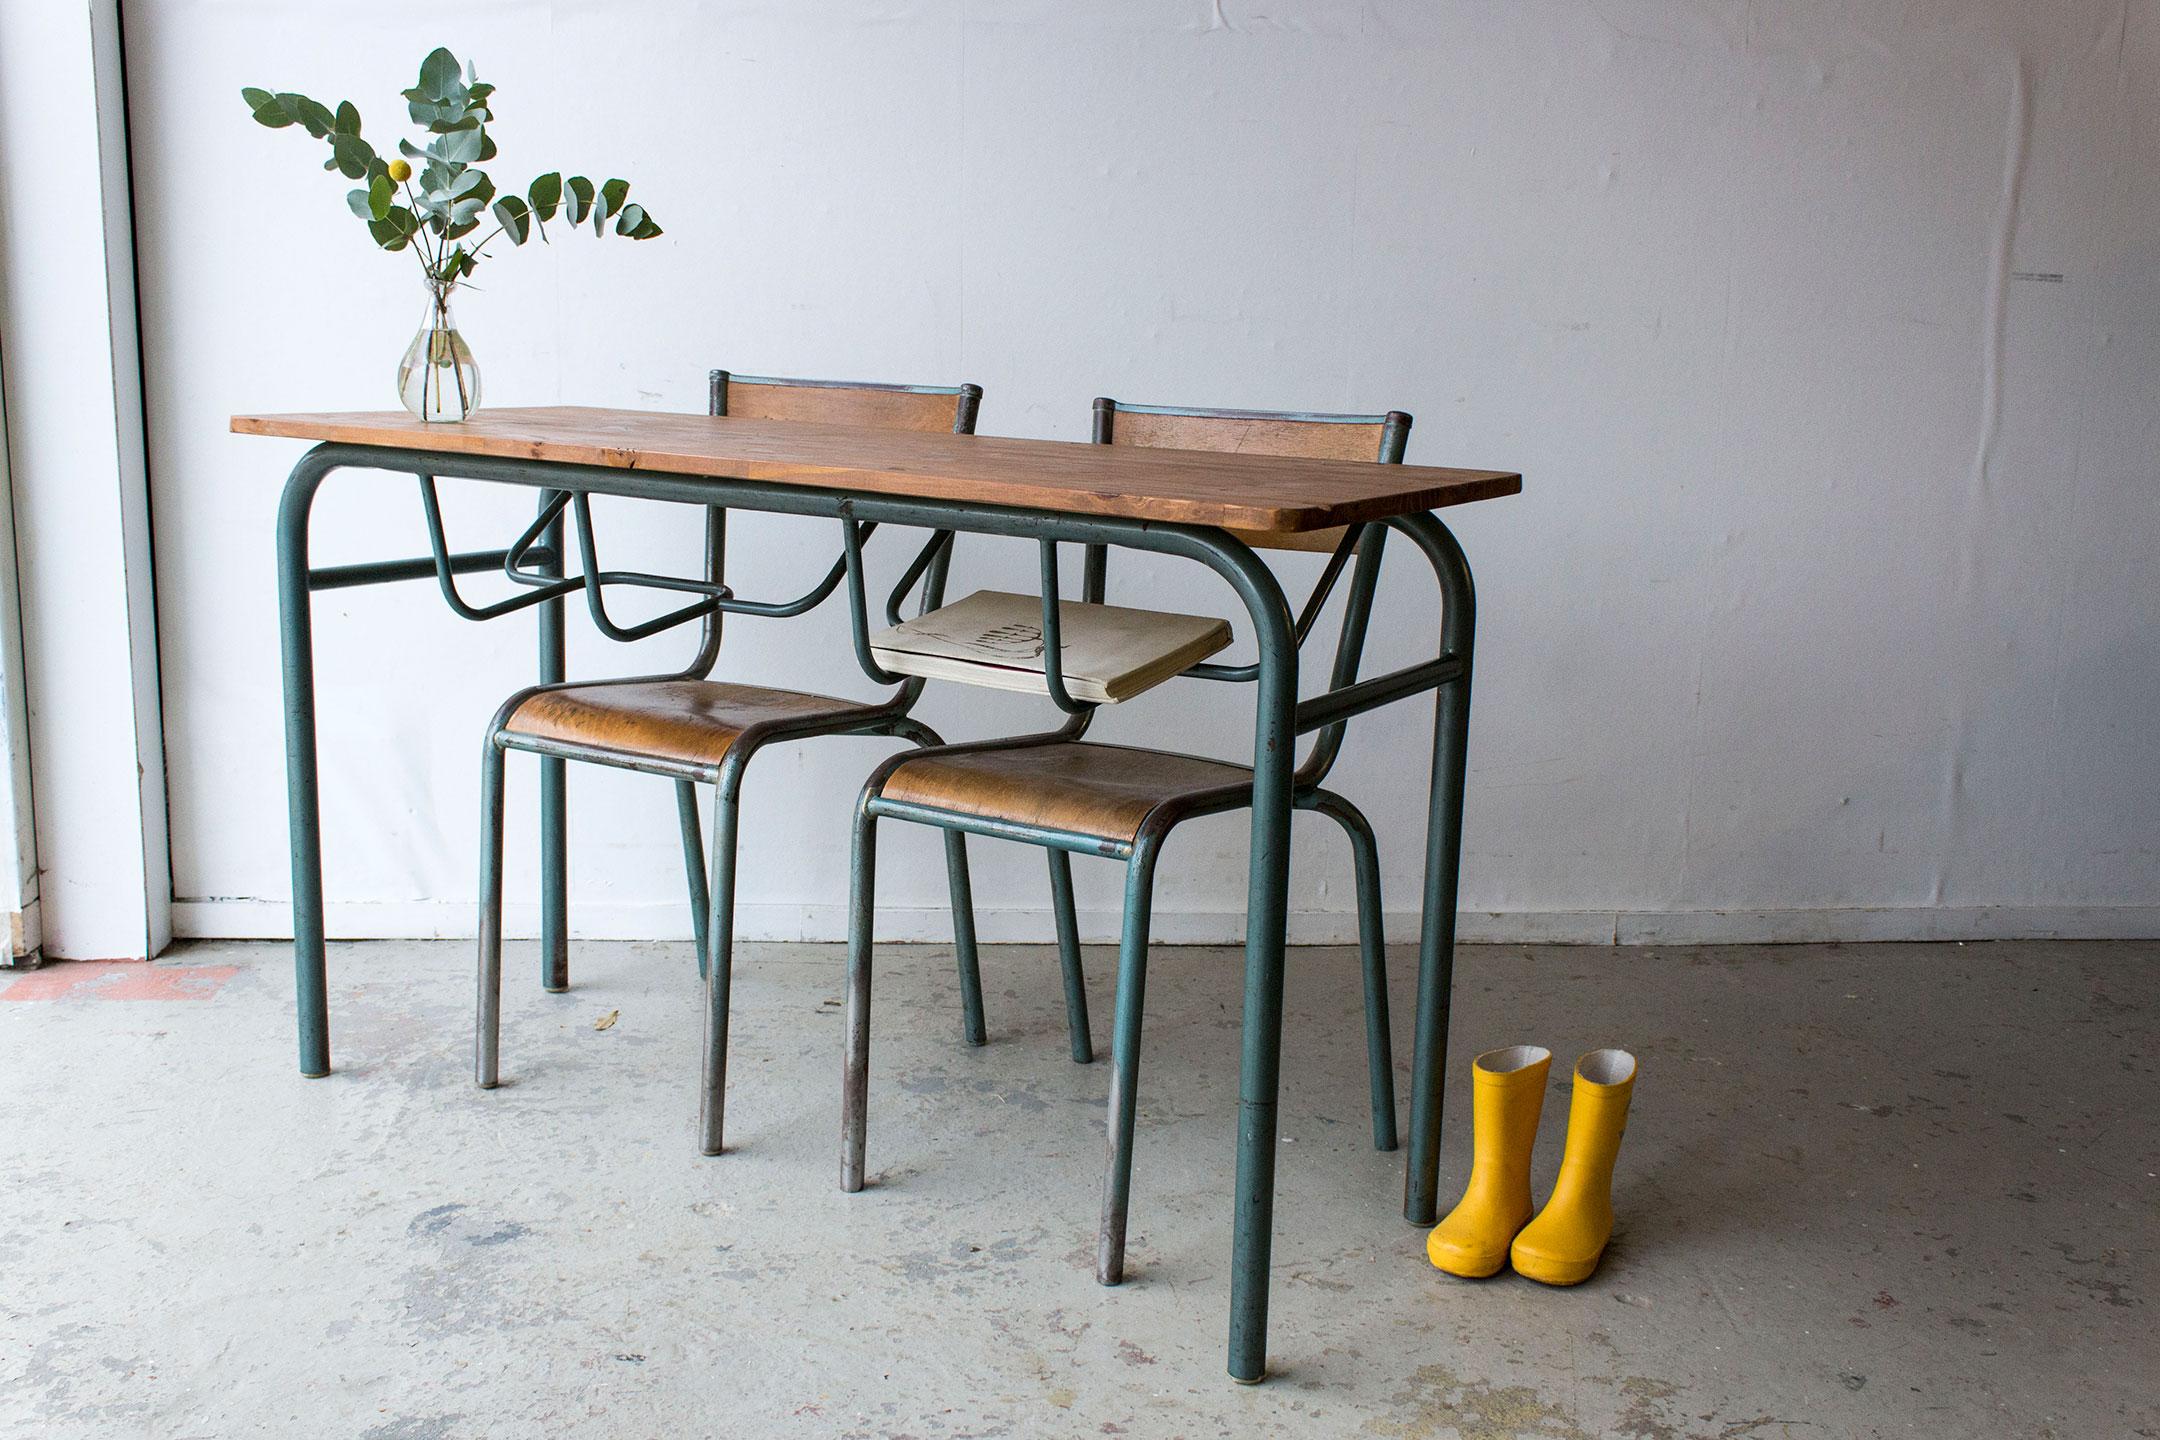 3170---vintage-schooltafel-grijsgroen-frame---Firma-zoethout_3.jpg